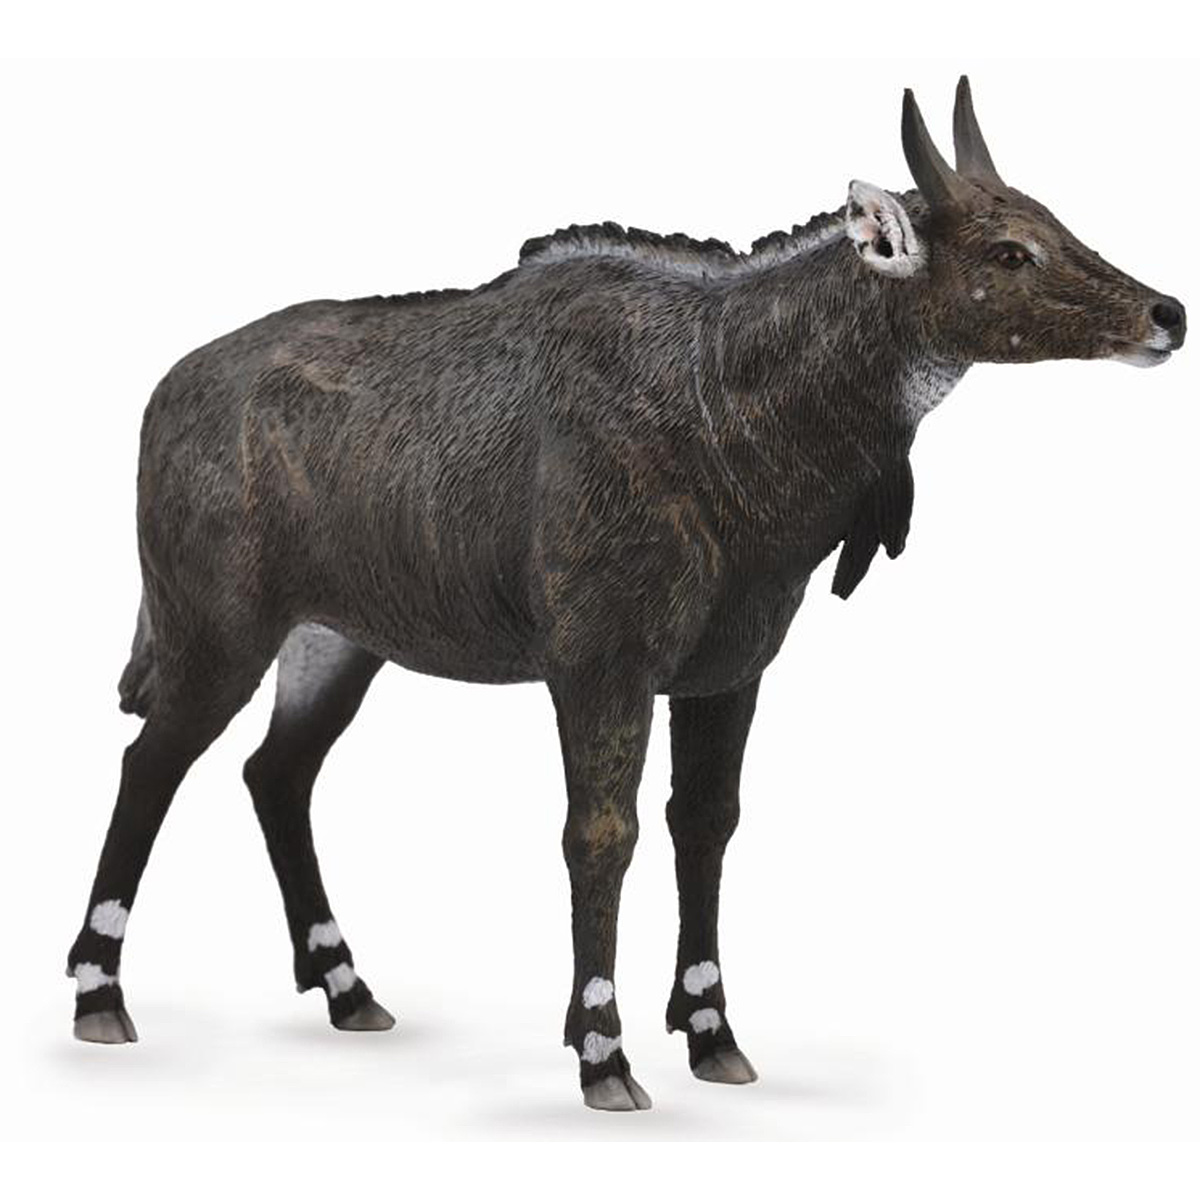 Купить Фигурка животного - Антилопа нильгау, размер M, Collecta Gulliver